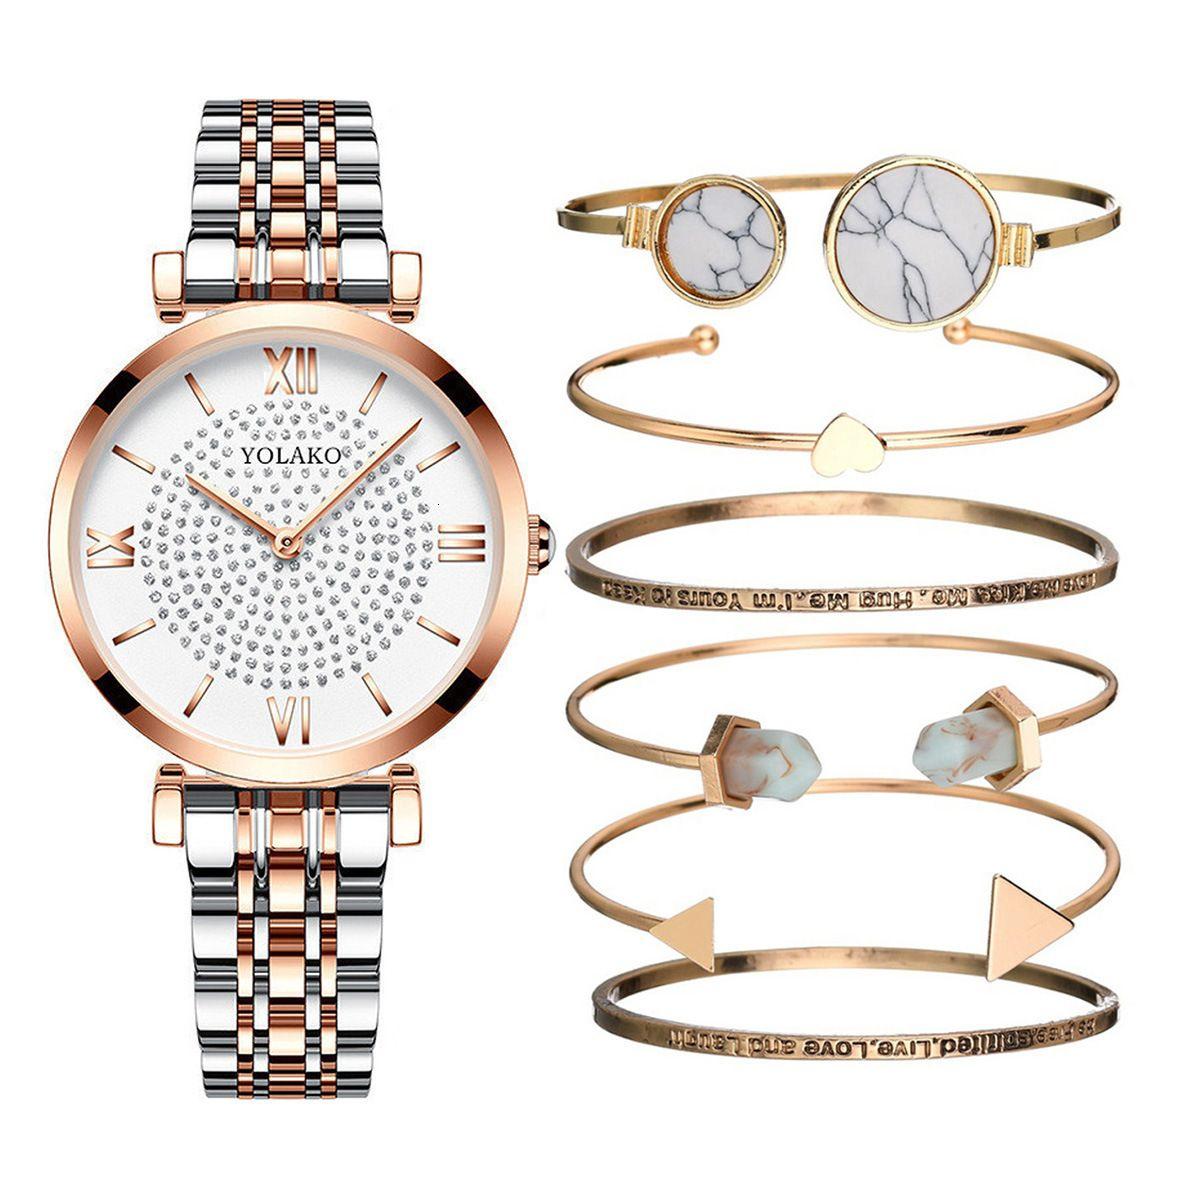 Luxo pulseira relógio terno 7 pcs / conjunto de aço inoxidável relógio dourado mulher relógio relógio relógio de quartzo marca relógios de pulso para as mulheres J1205